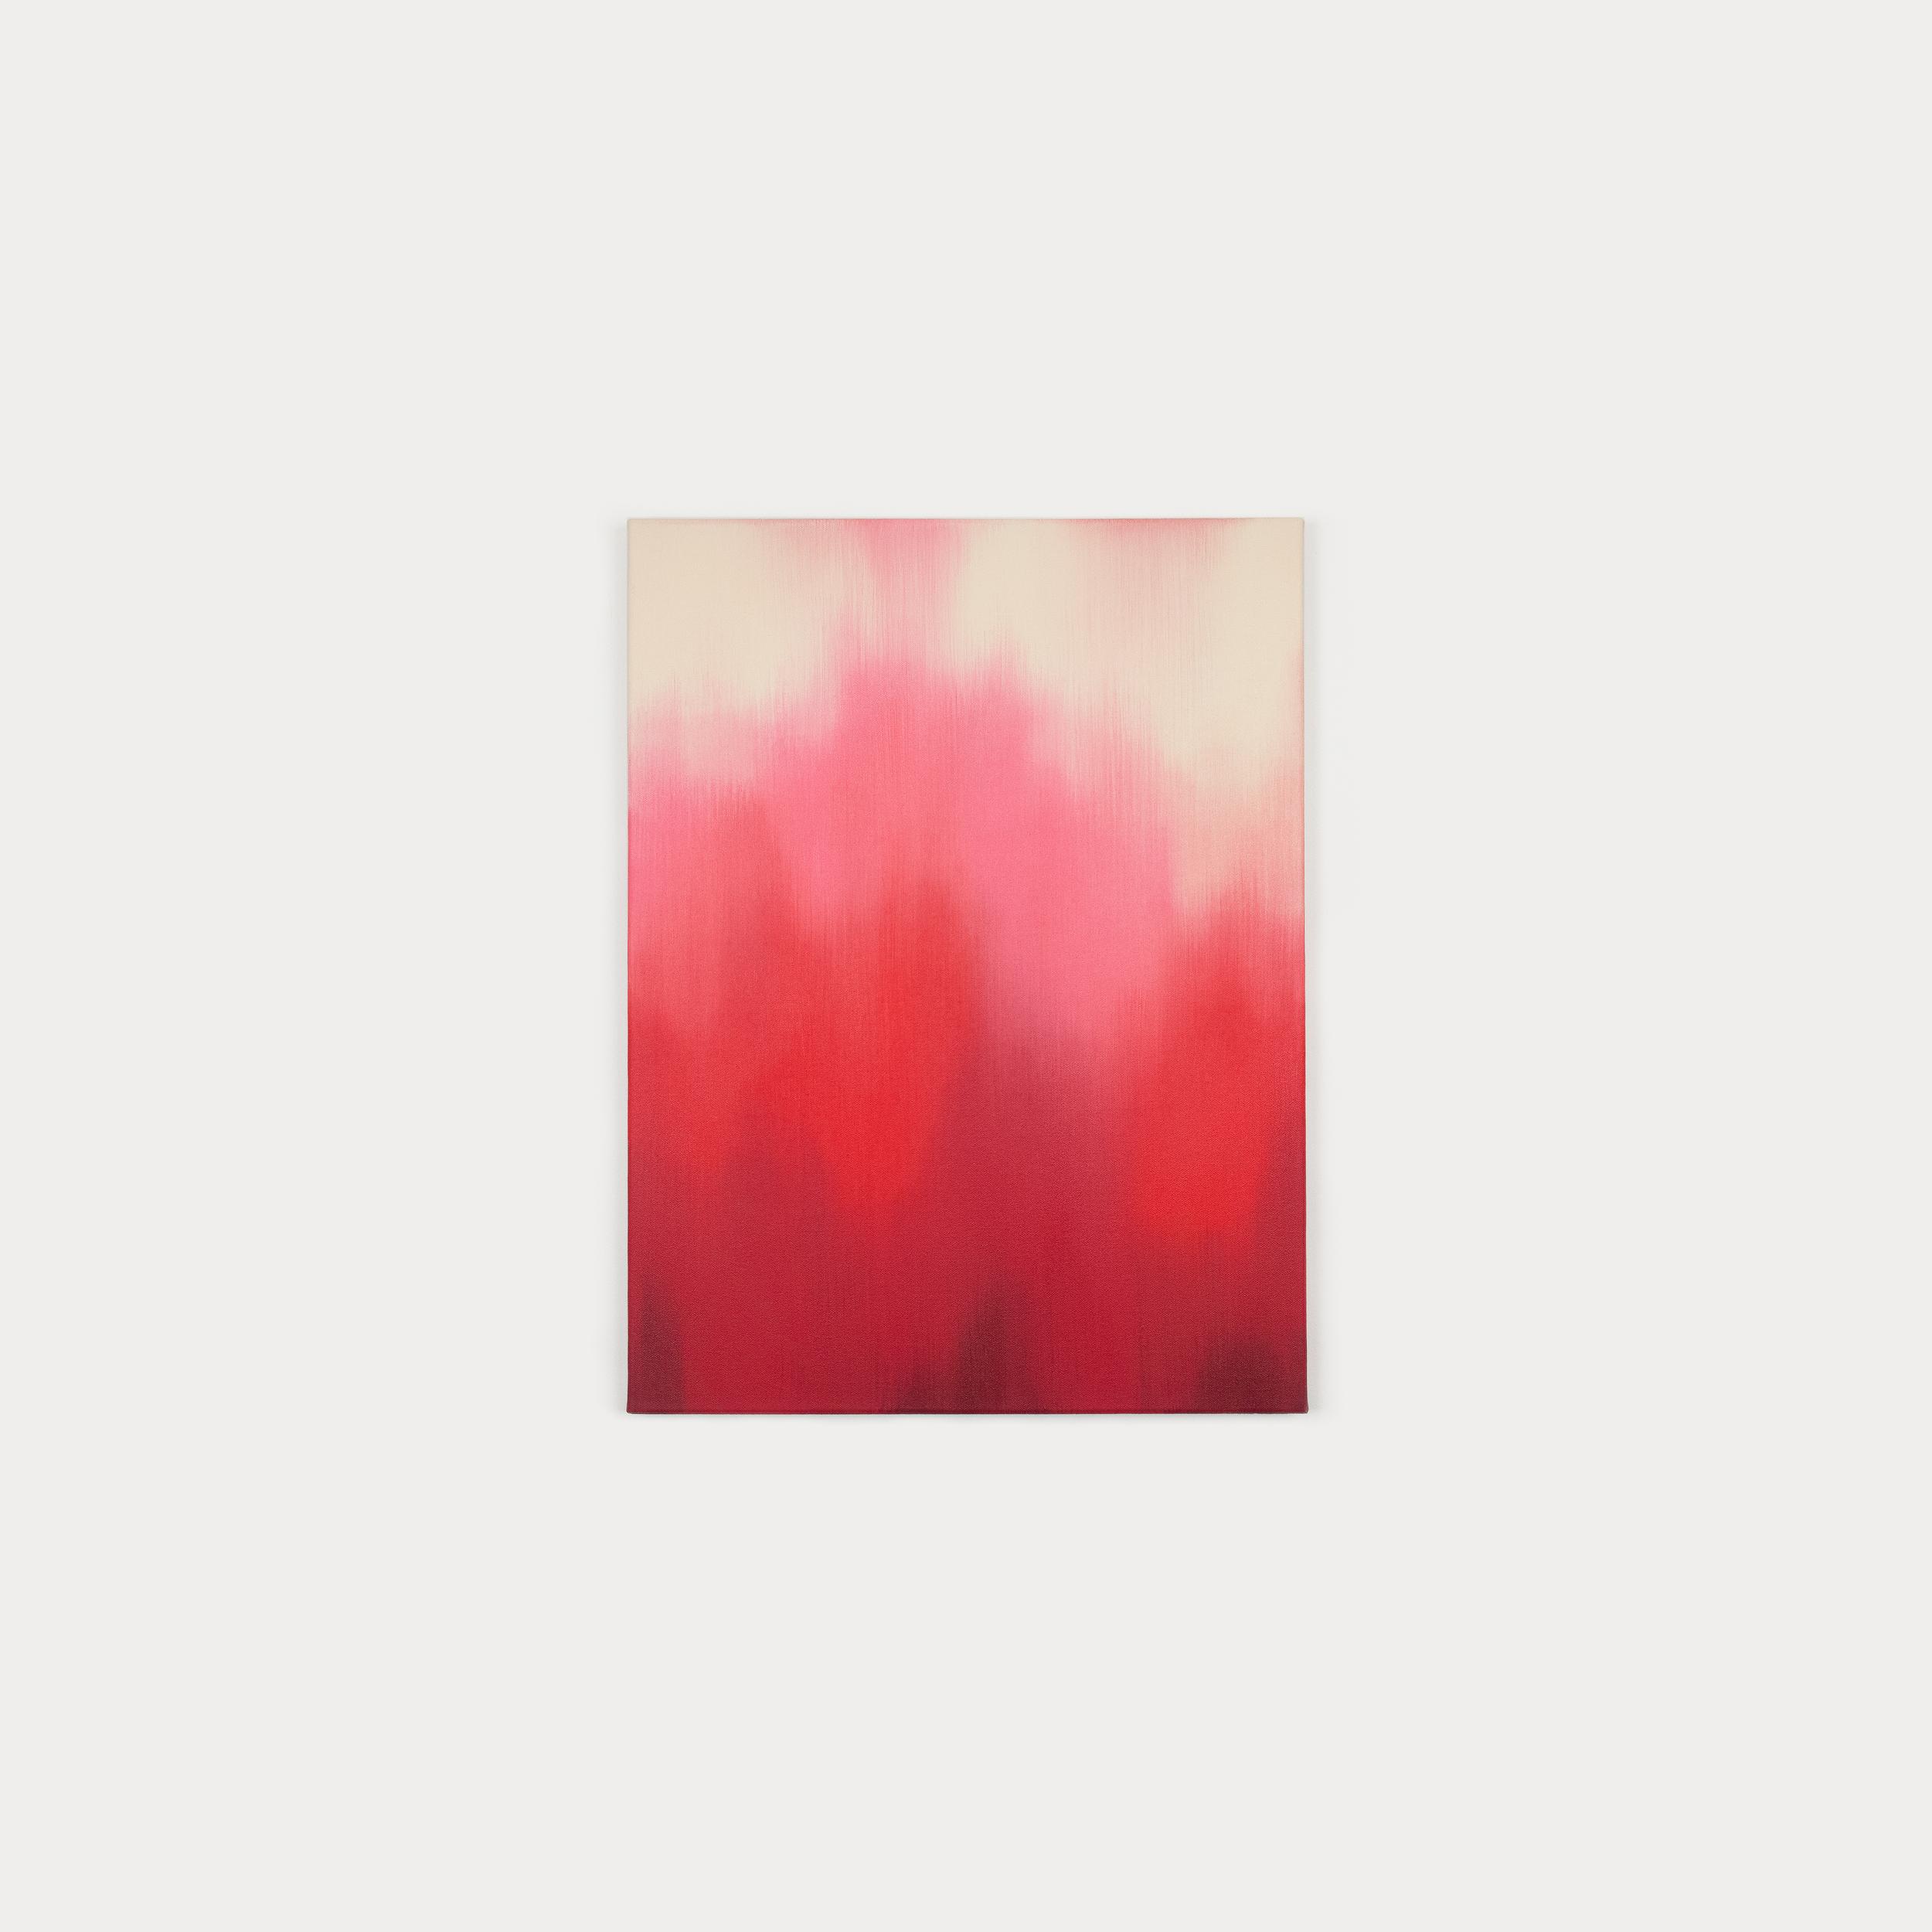 """Pensamento rosa"" oil painting by Thiciana Cruz"